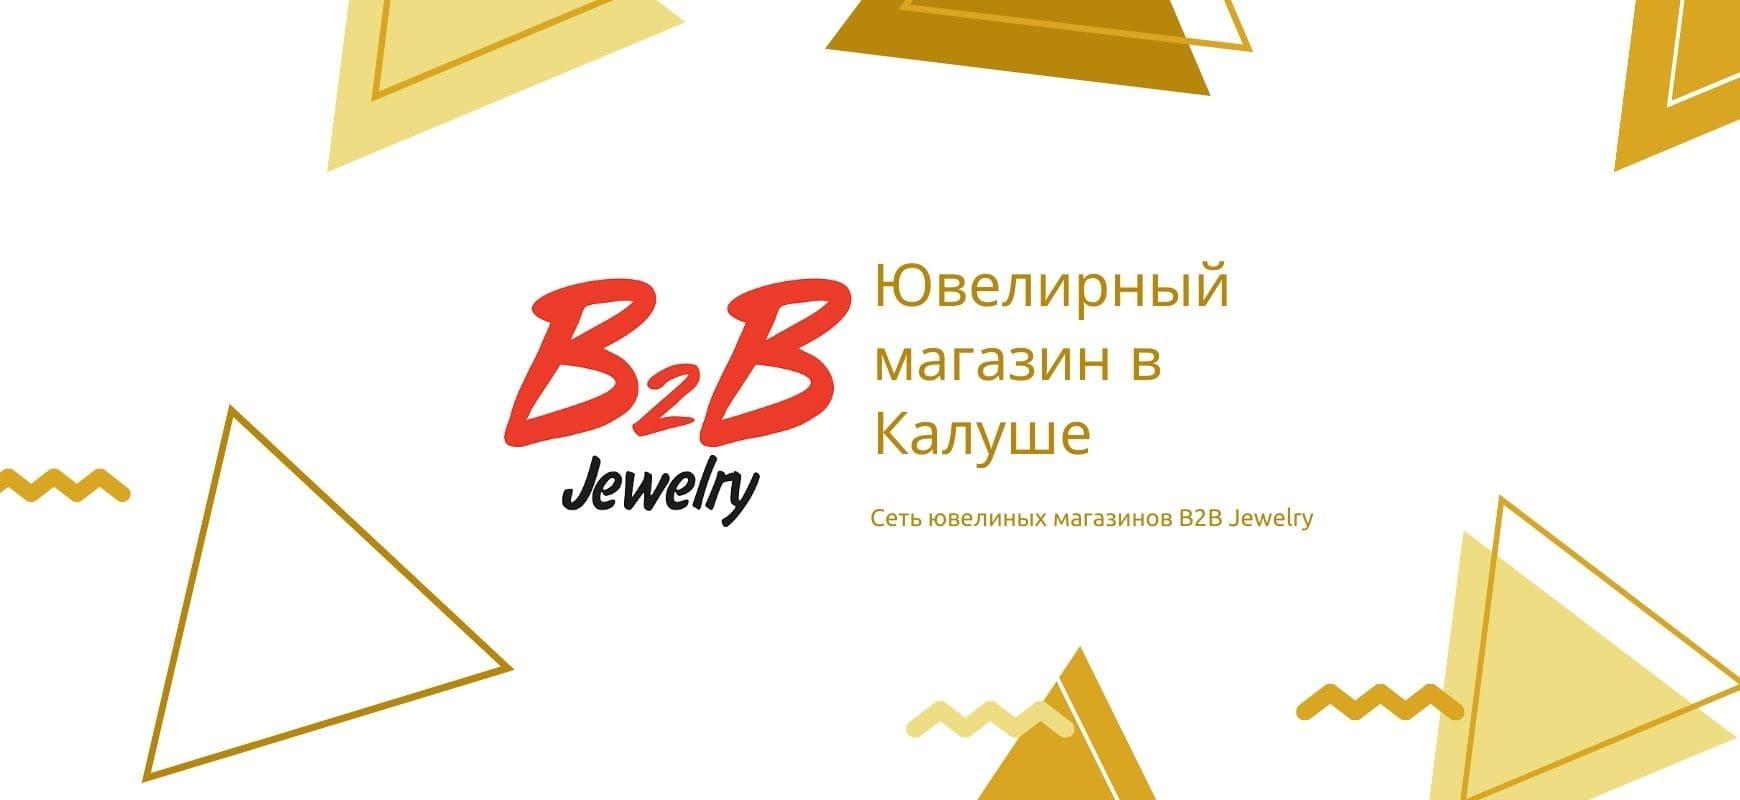 B2B JEWELRY КАЛУШ